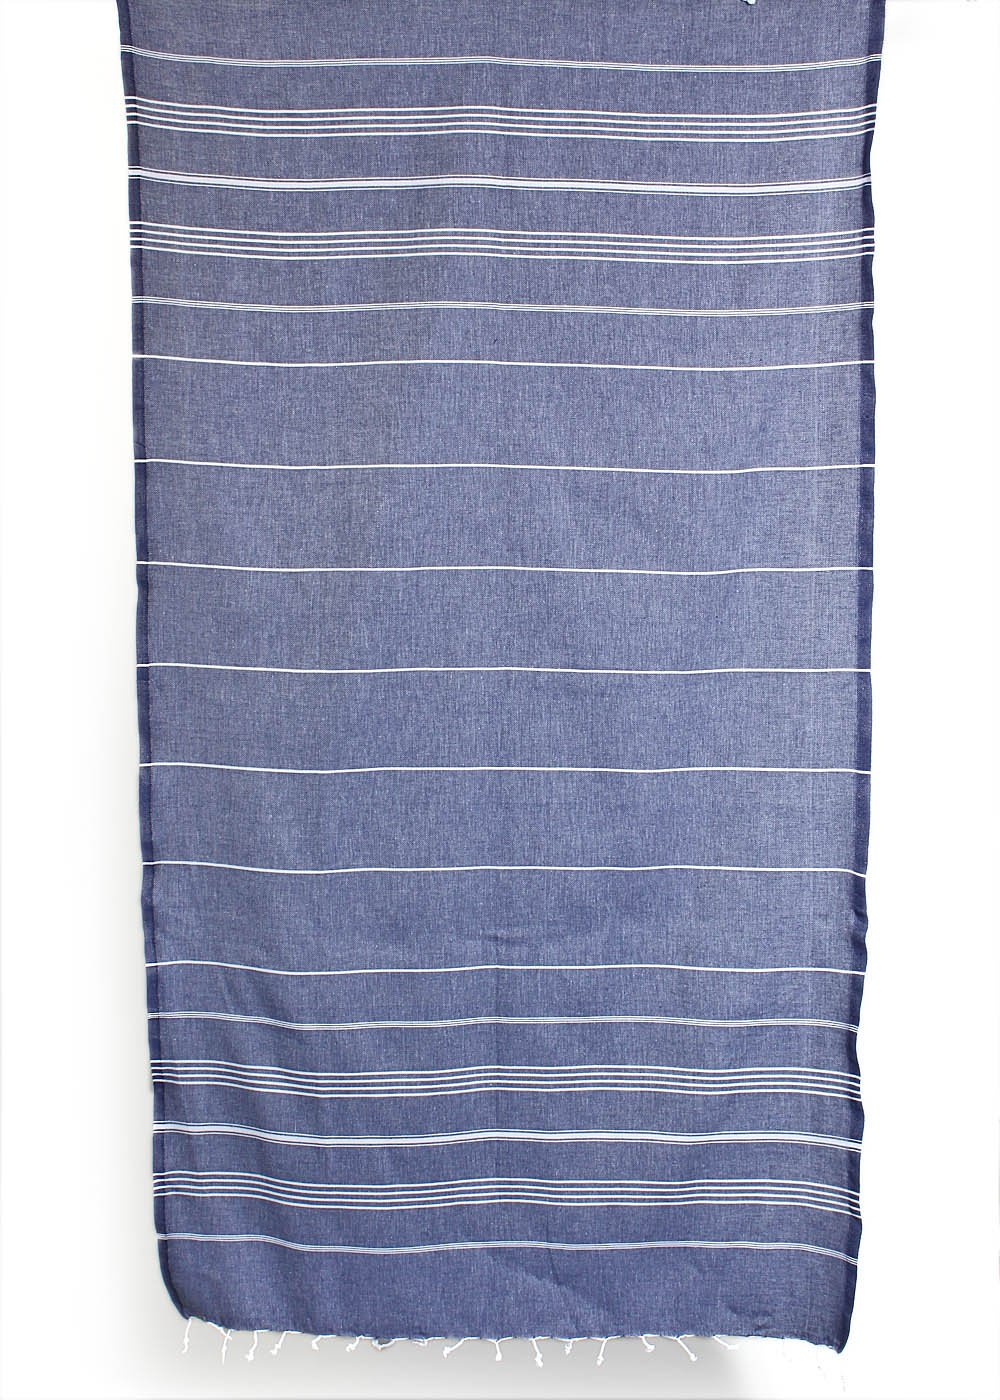 Cacala 100% Cotton Pestemal Turkish Bath Towel, 37 x 70, Dark Blue by Cacala (Image #5)